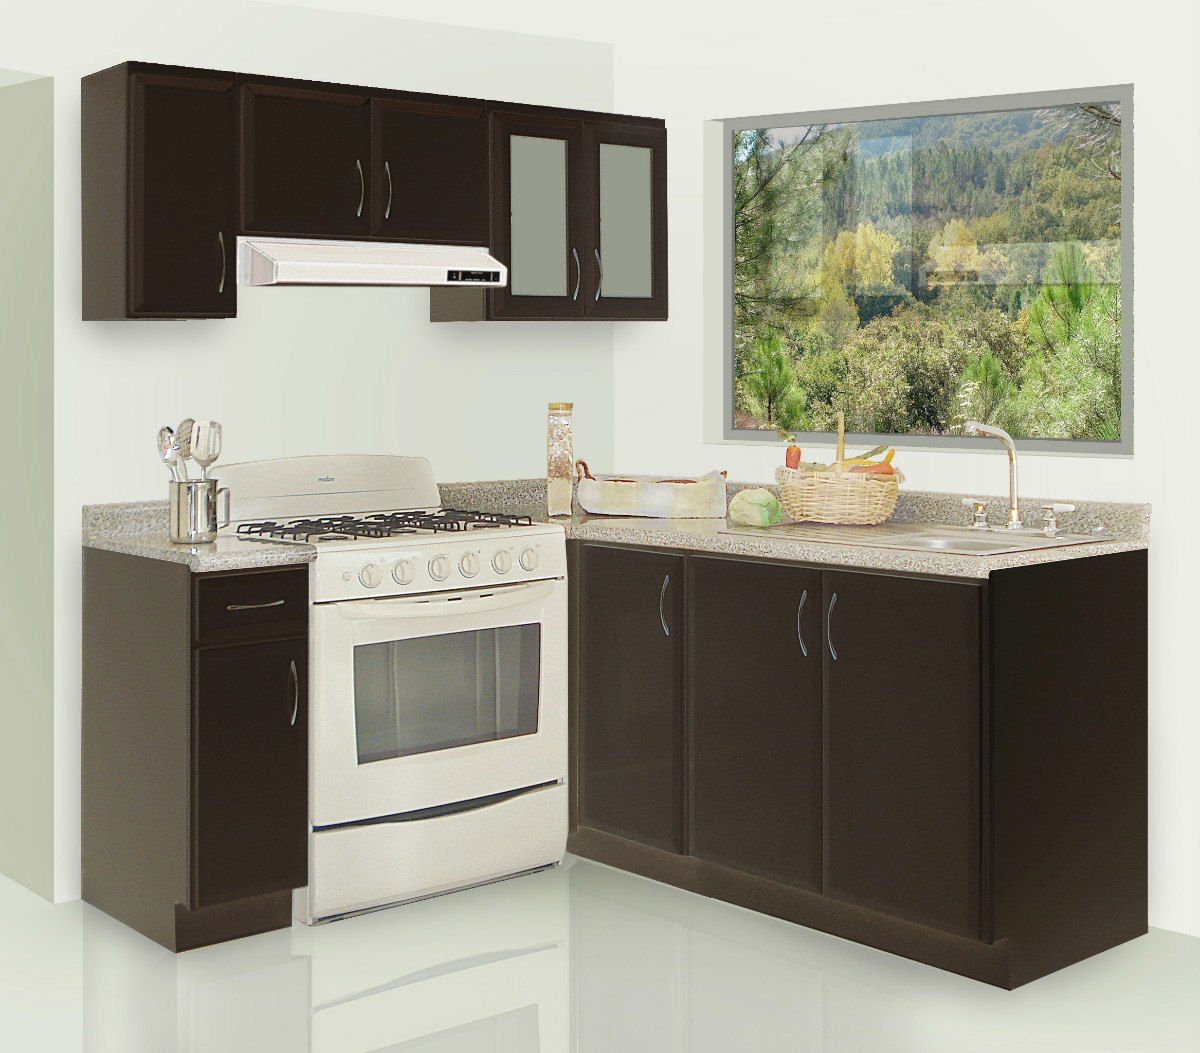 Imagenes de cocinas integrales modernas cocinas - Cocinas modernas fotos ...